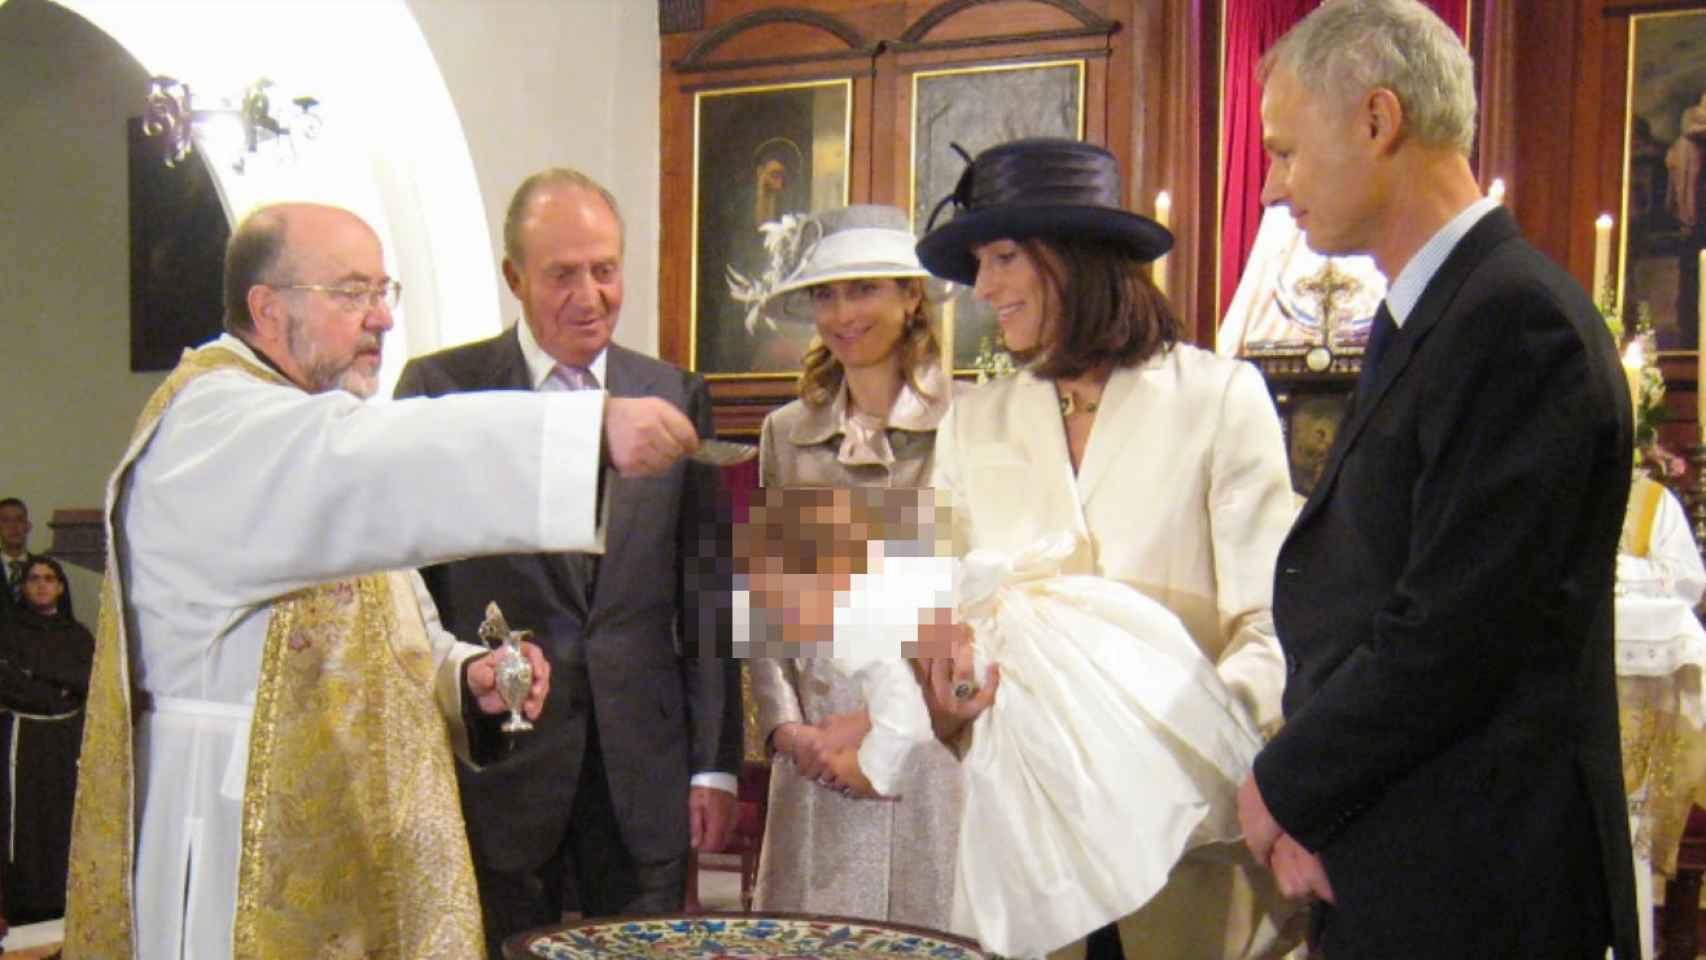 Bautizo de la hija de Álvaro de Orleans-Borbón, con Juan Carlos I como padrino.